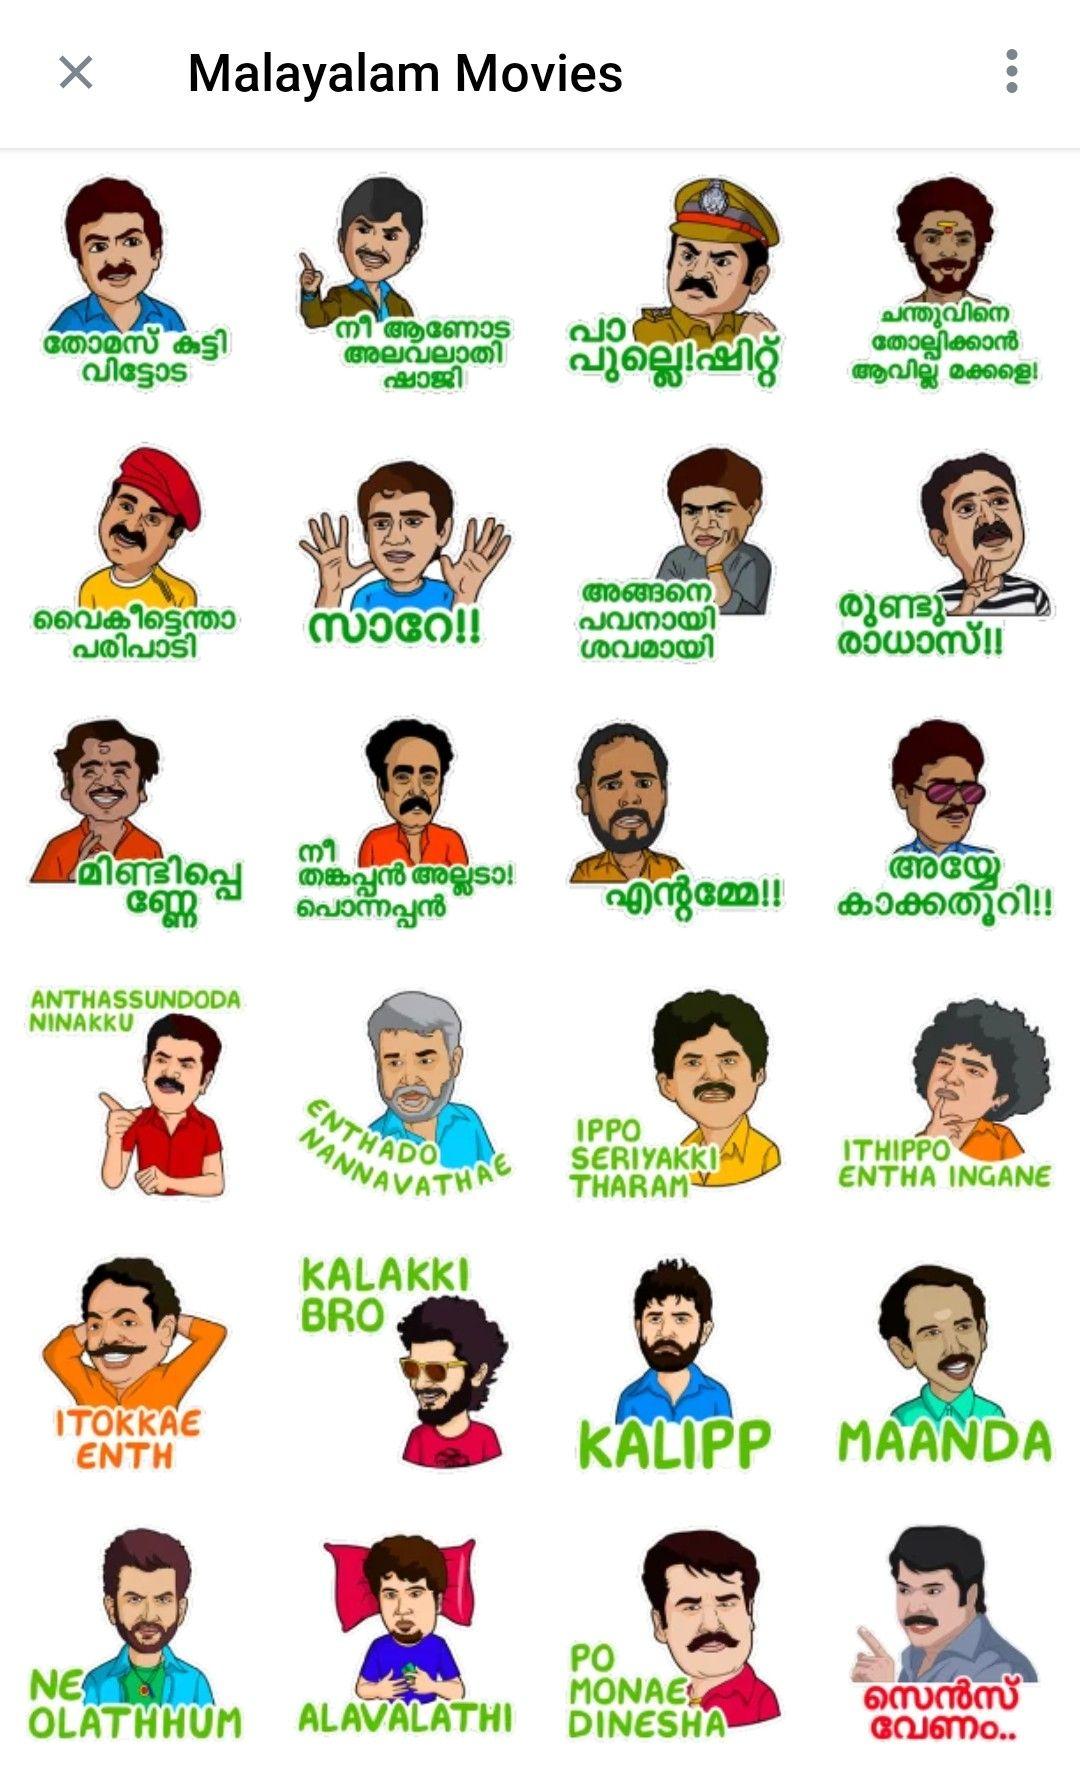 Download Malayalam Movies Telegram Sticker pack | Telegram stickers